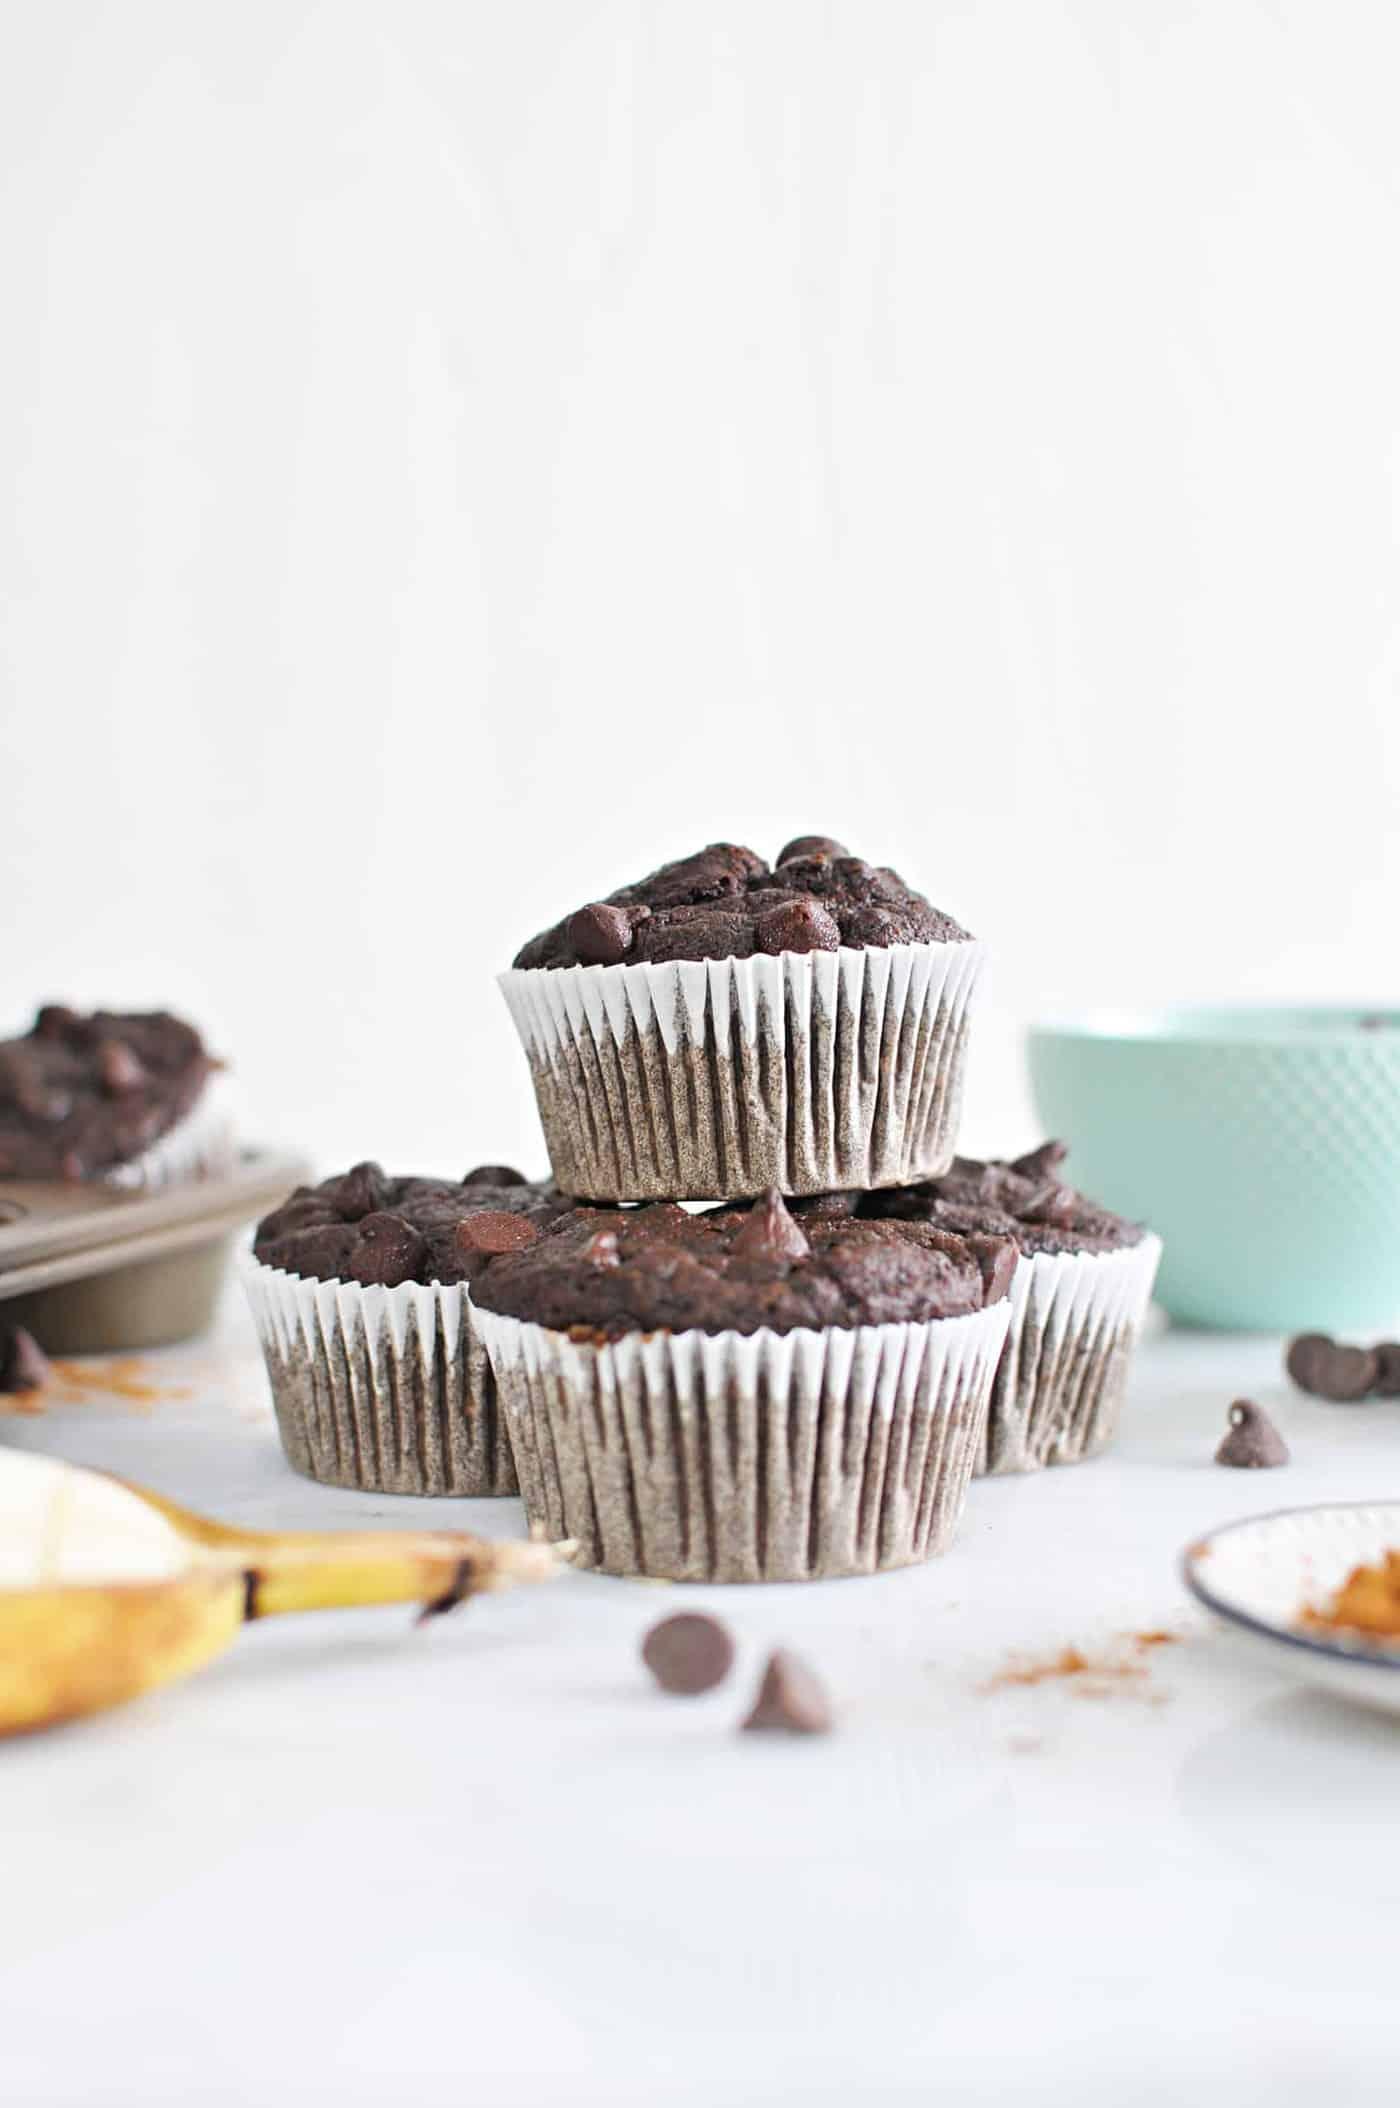 Chocolate Banana Muffins (Gluten-Free) recipe via thepigandquill.com #baking #dessert #sweets #breakfast